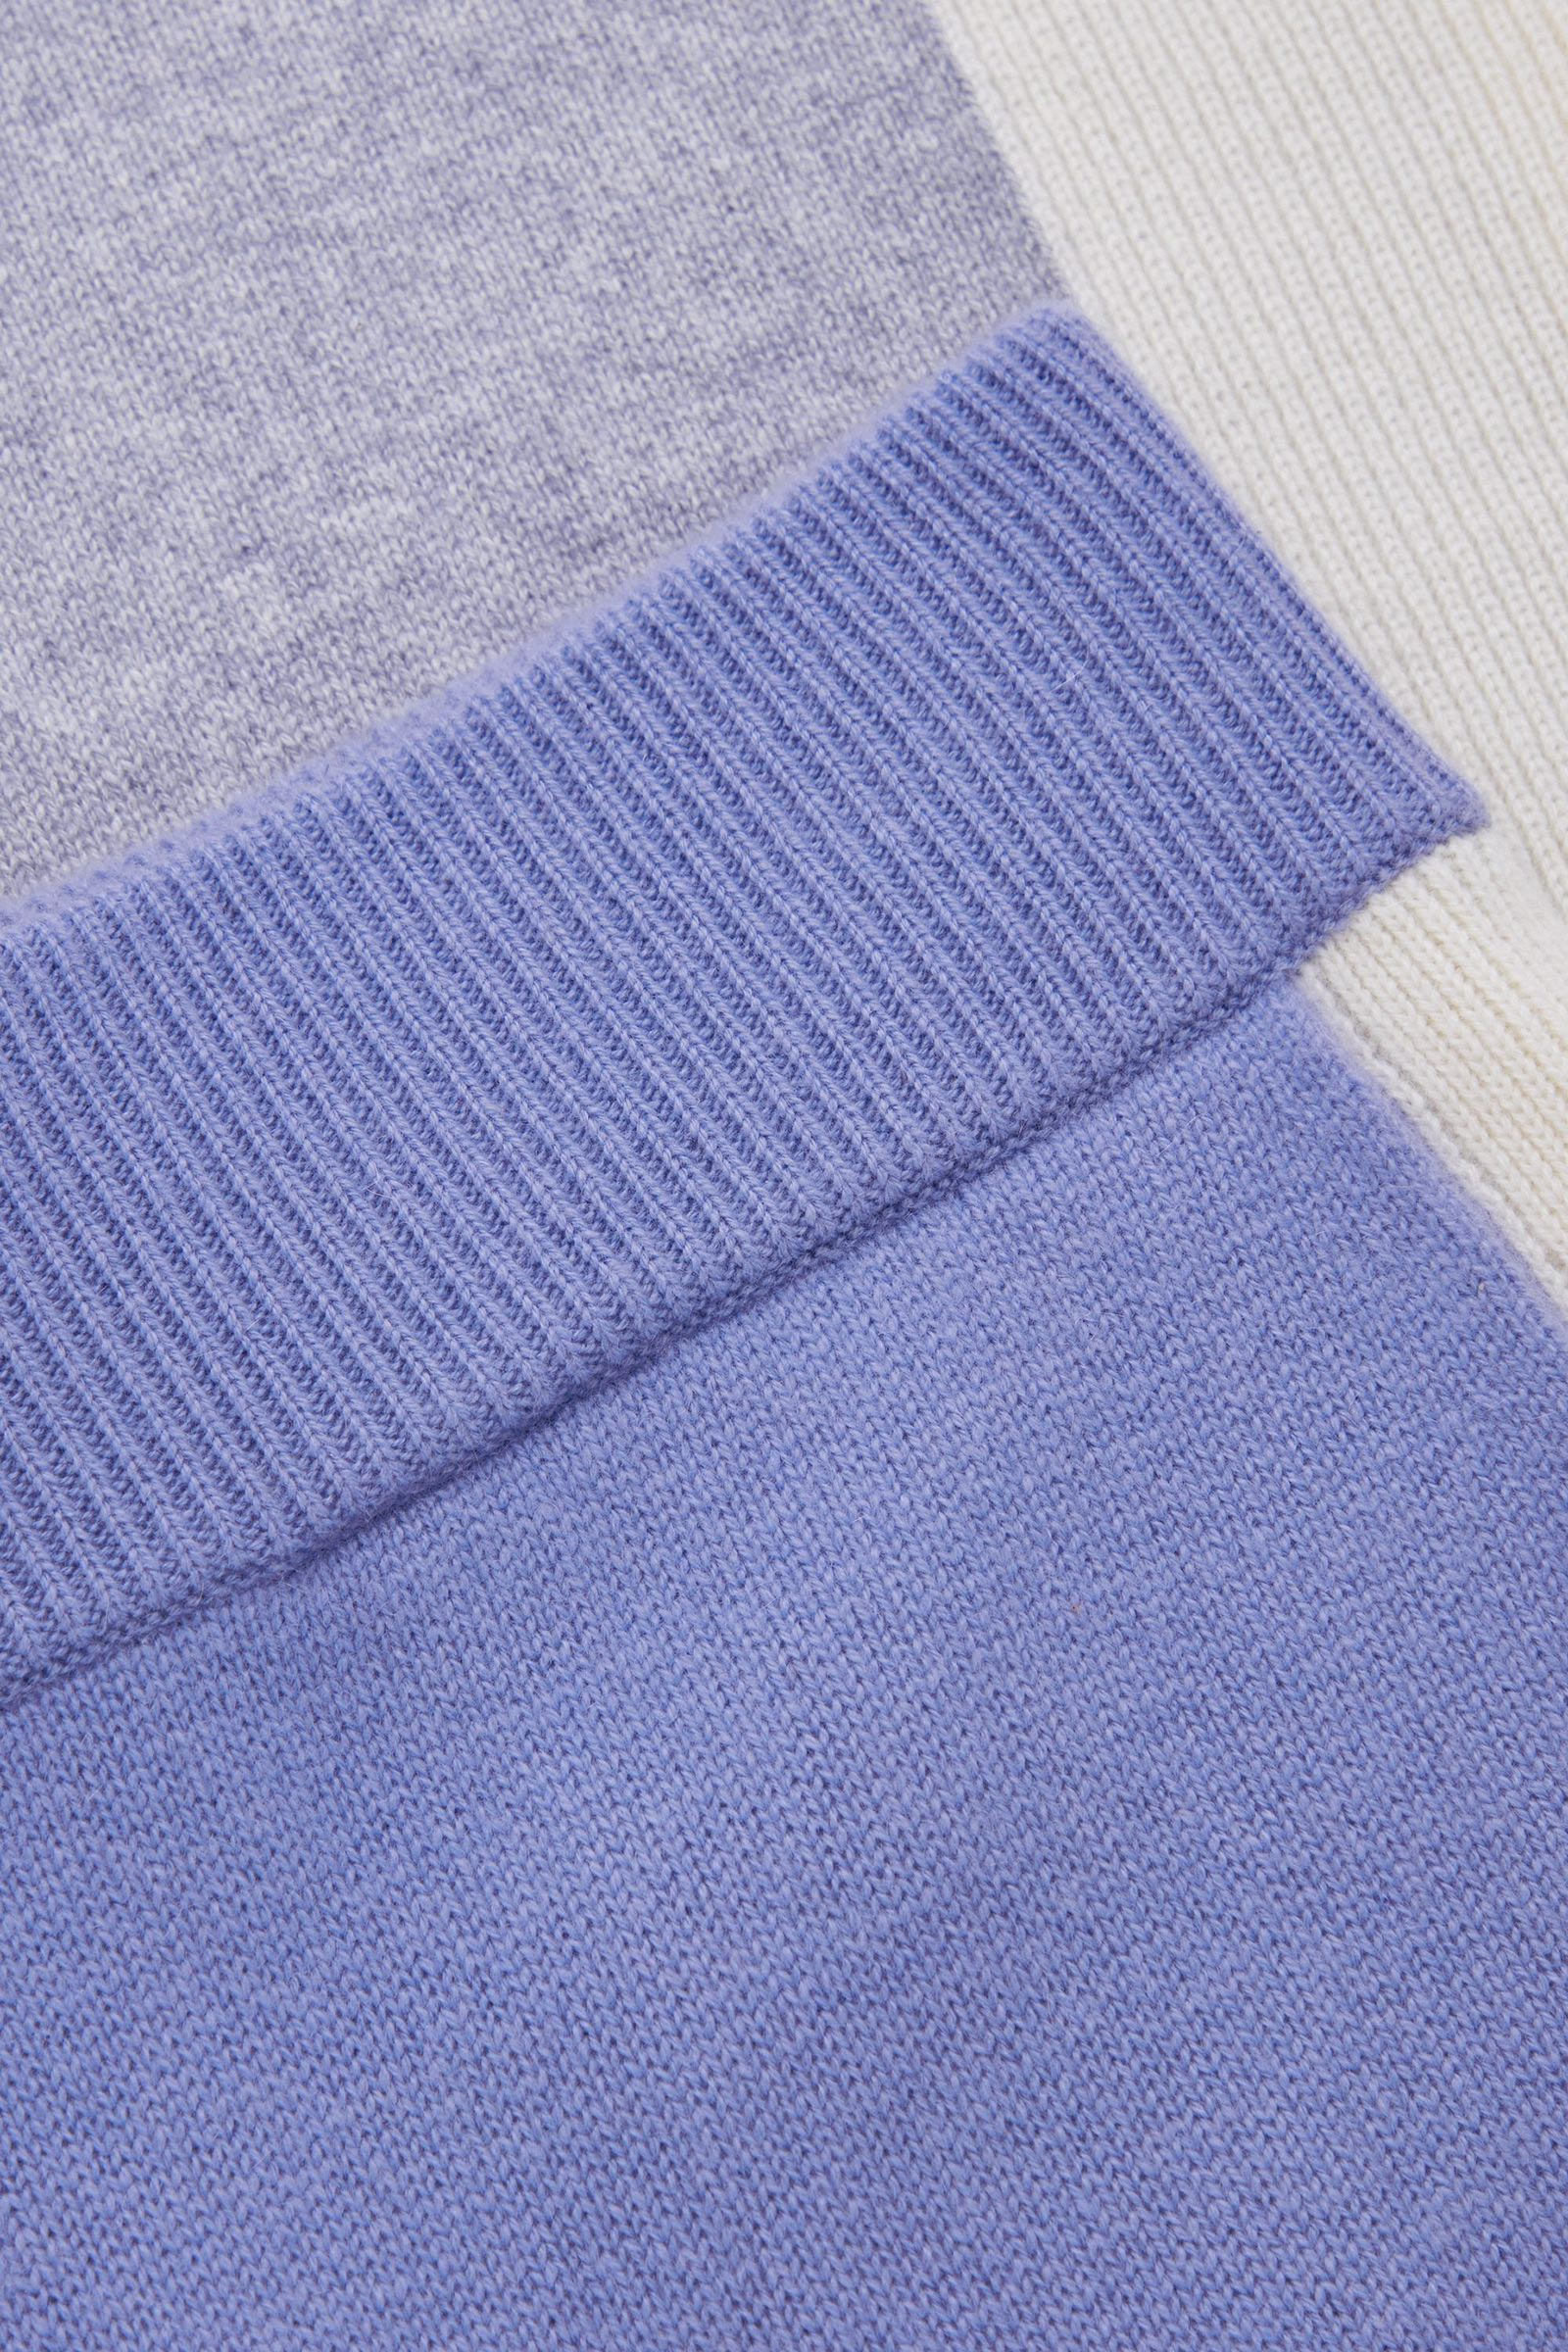 COS 컬러 블록 캐시미어 드로우스트링 트라우저의 블루컬러 Detail입니다.